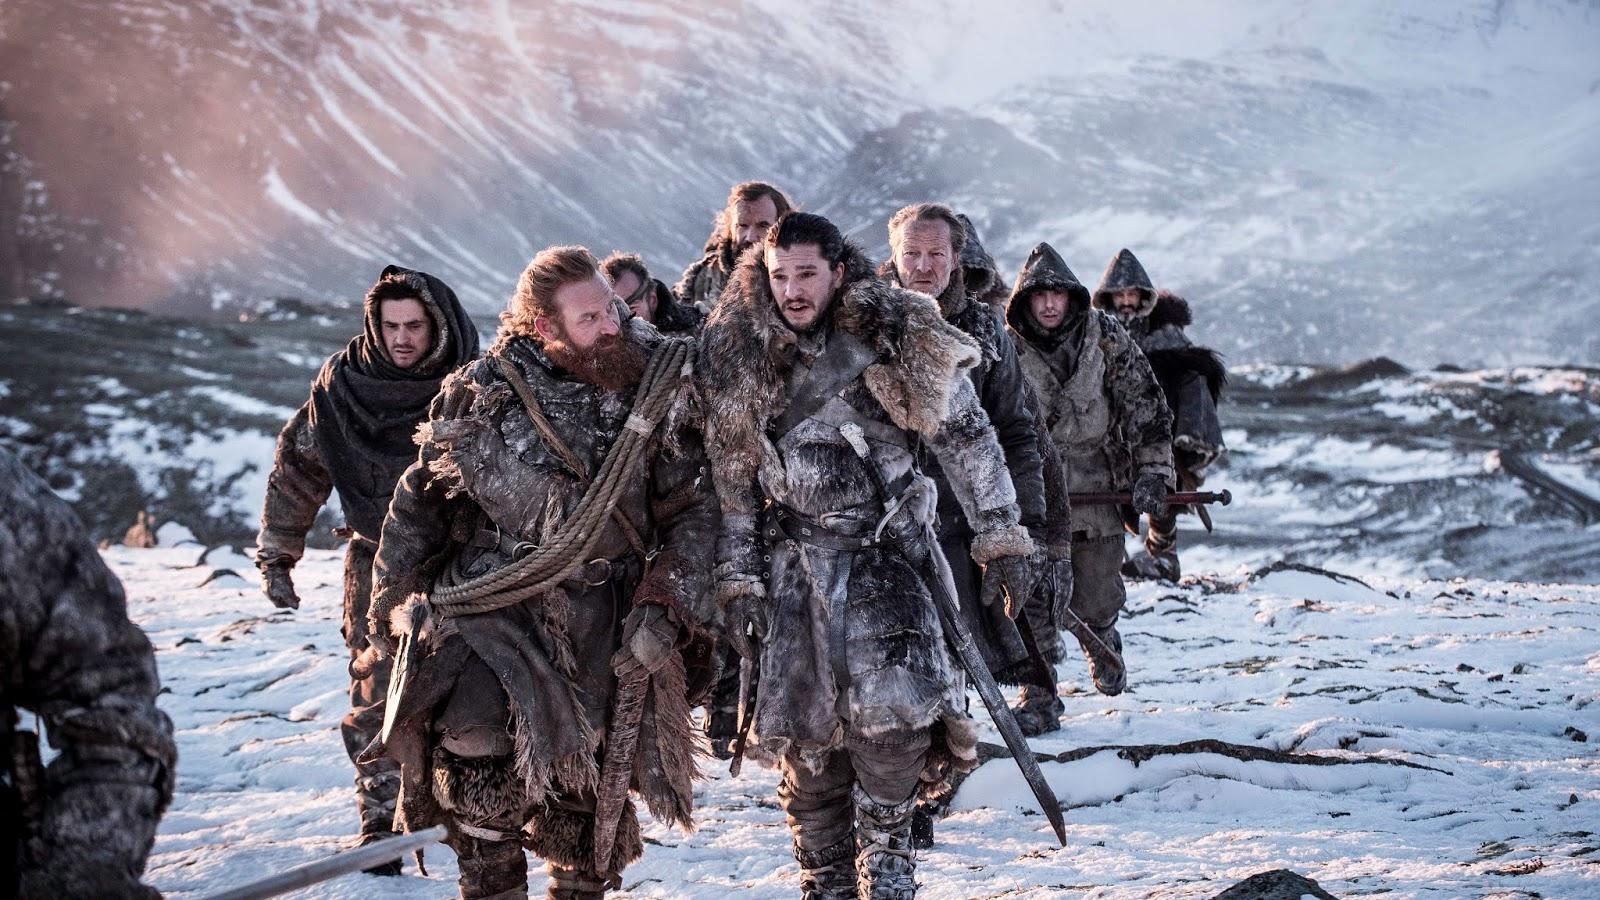 Game Of Thrones,Game Of Thrones 4k,خلفيات مسلسل صراع العروش,صراع العروش,خلفيات صراع العروش, 4k wallpaper, خلفيات